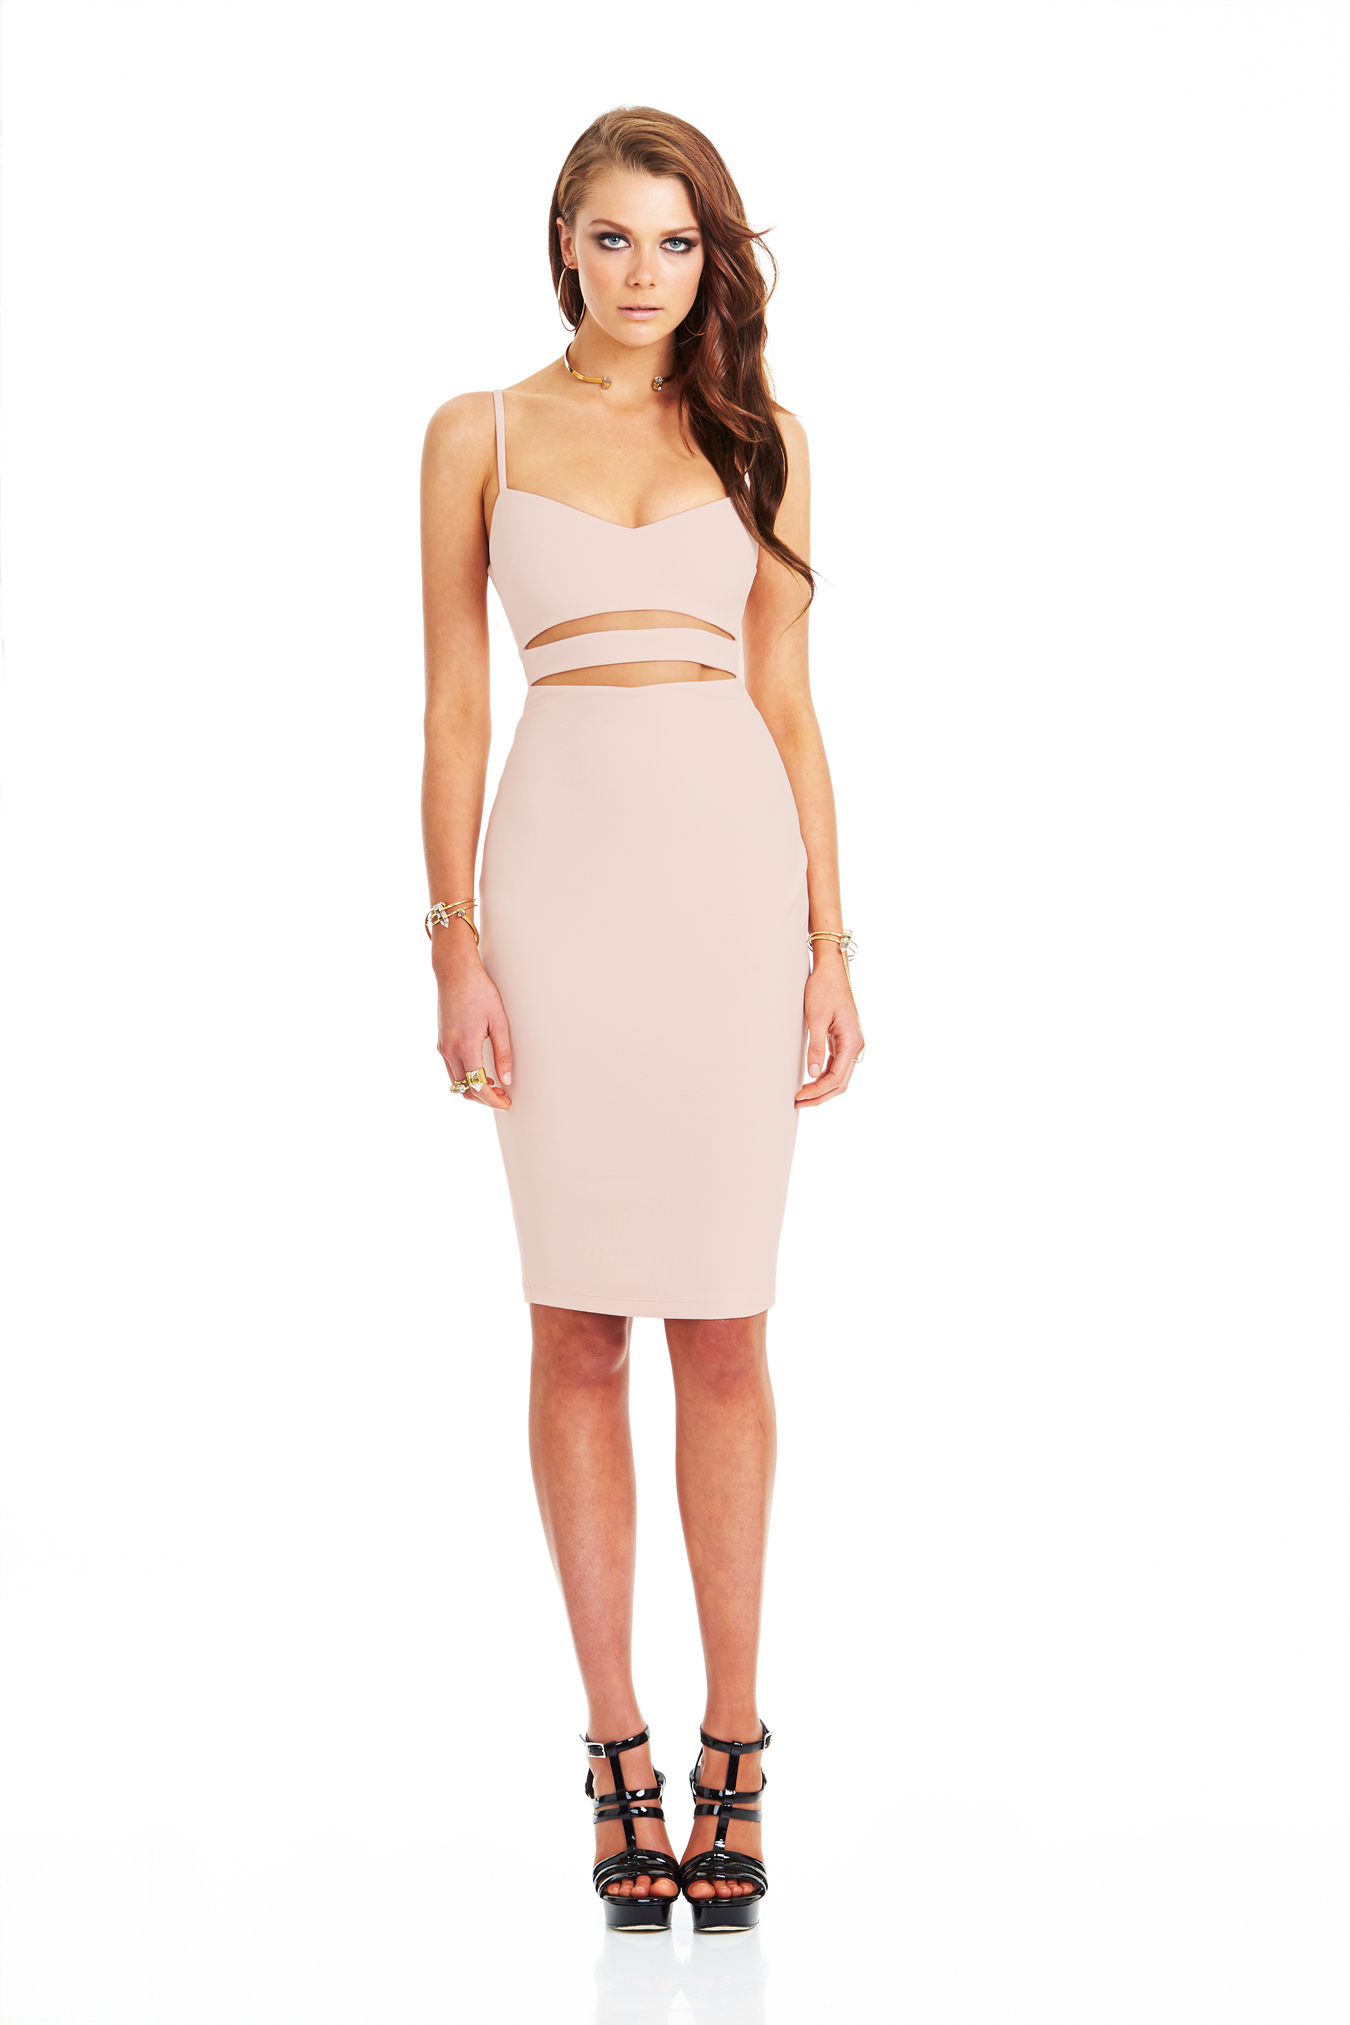 1bc6fc39062c New Nude Bridget Bustier Dress : Buy Designer Dresses Online at Nookie